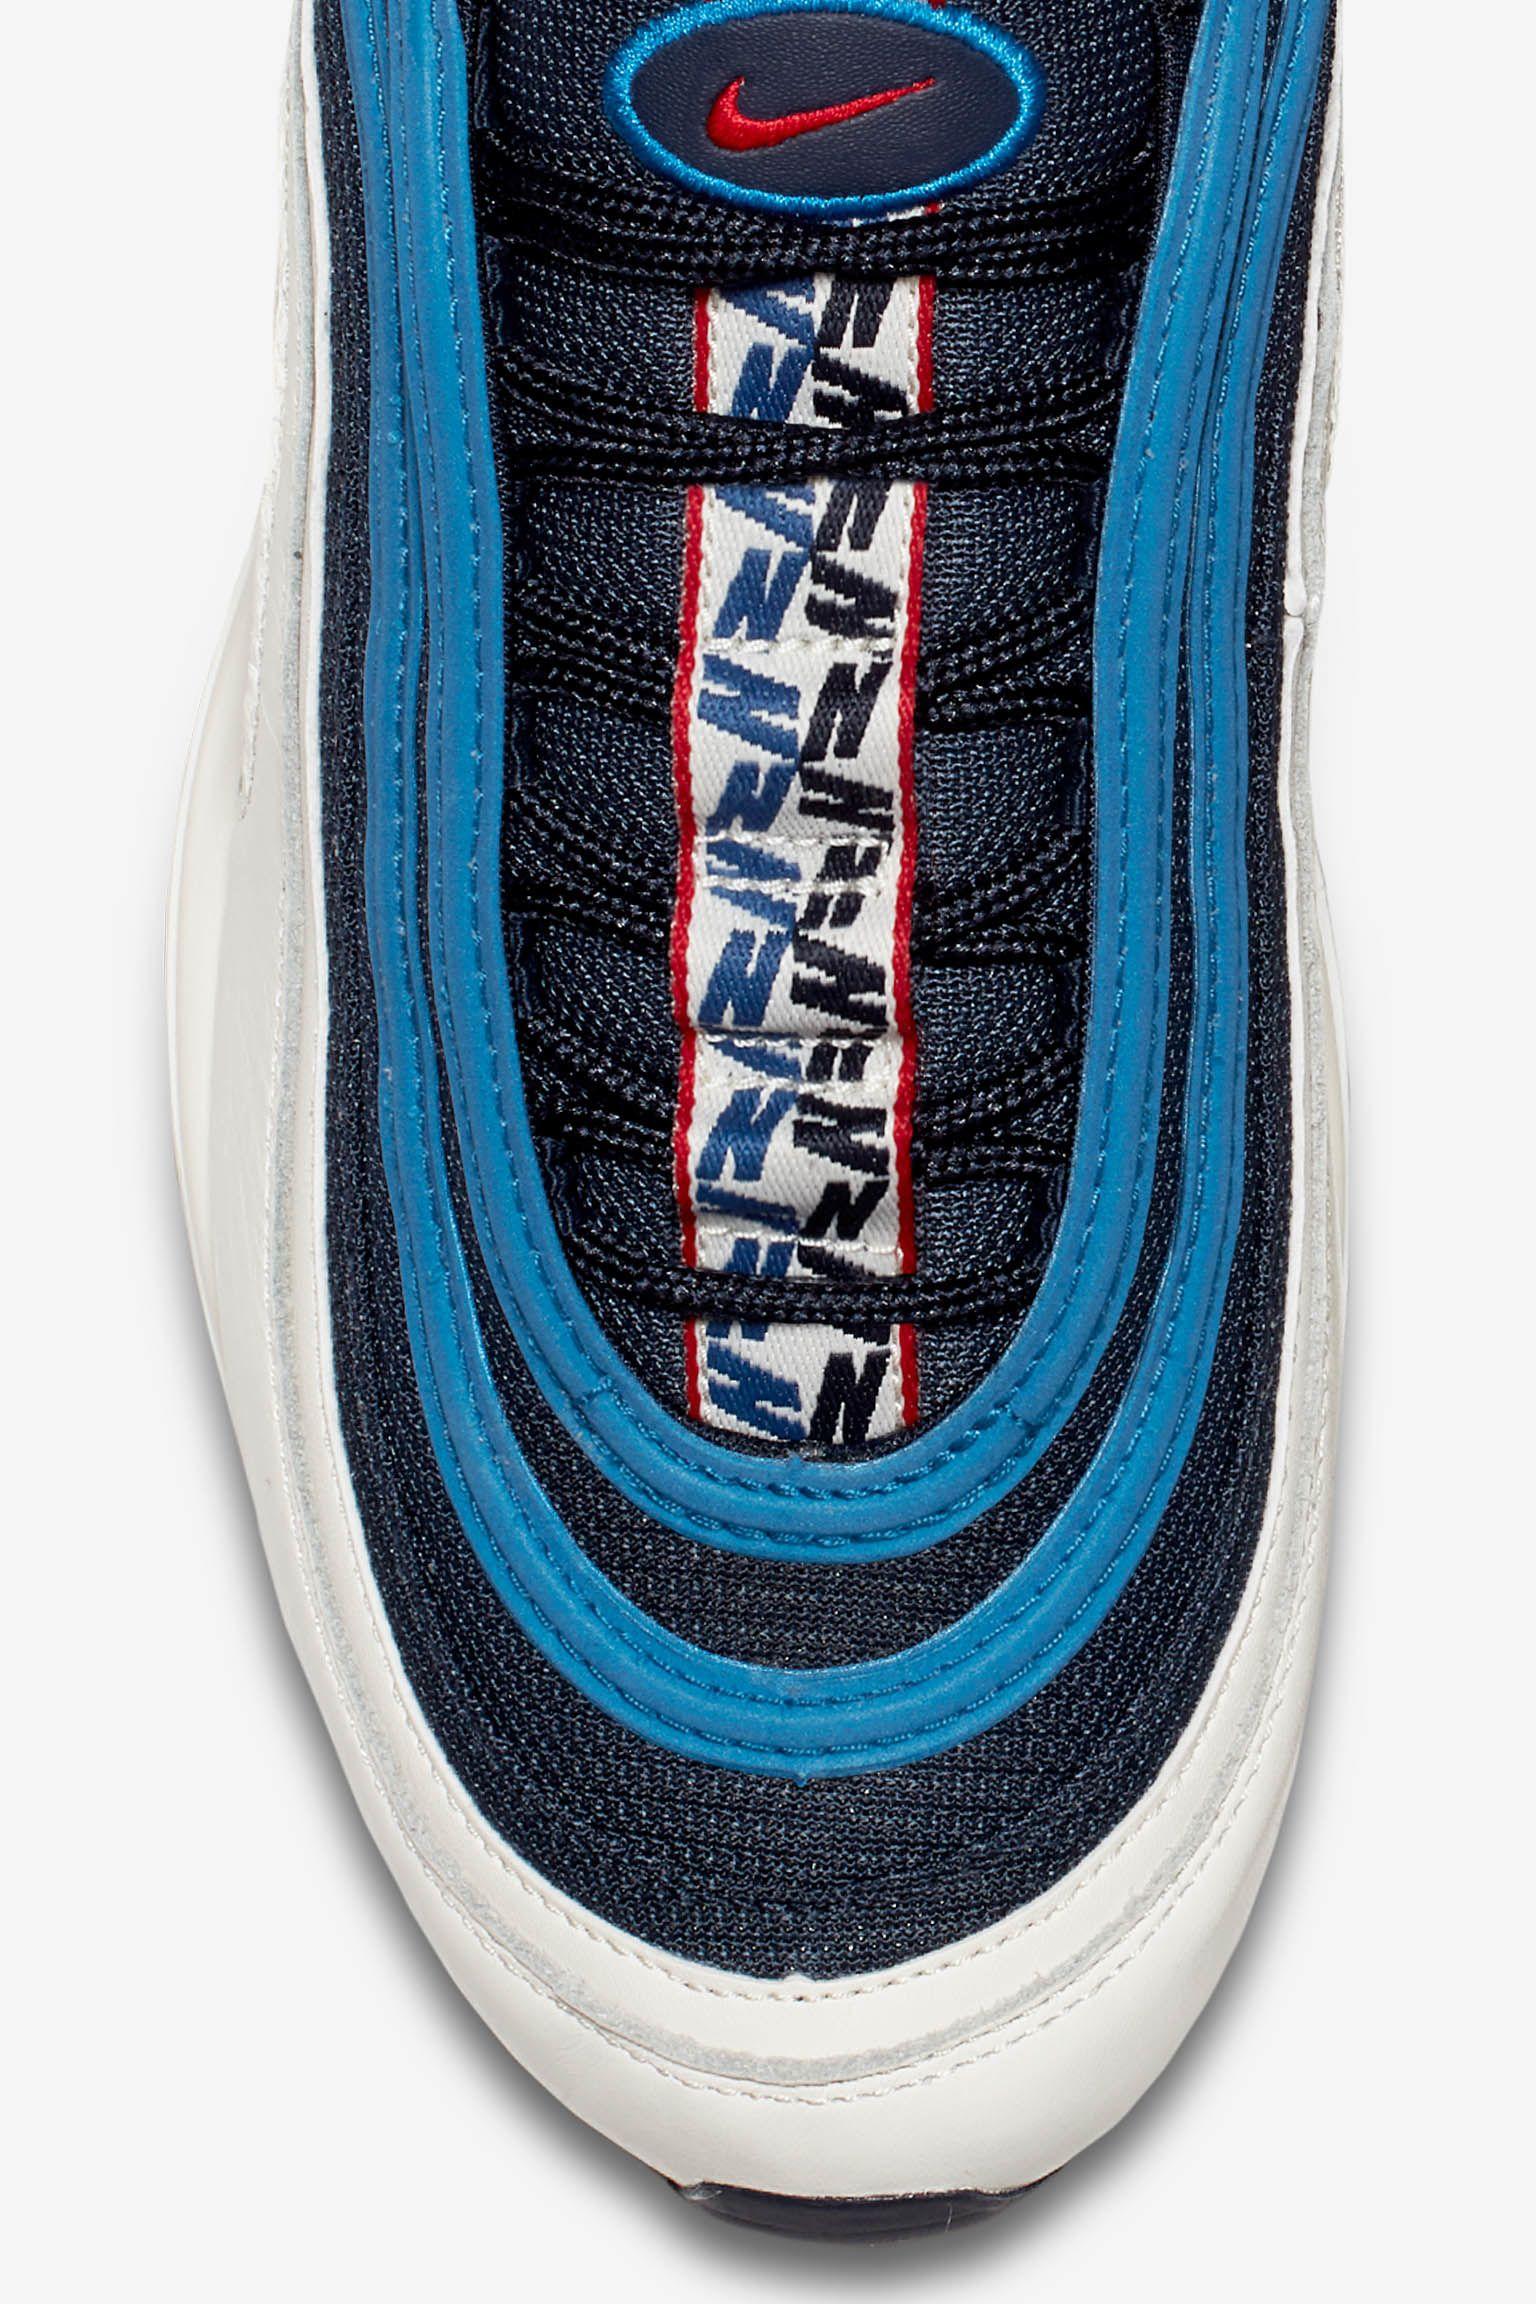 Nike Air Max 97 'Obsidian & Sail' Release Date. Nike SNKRS LU